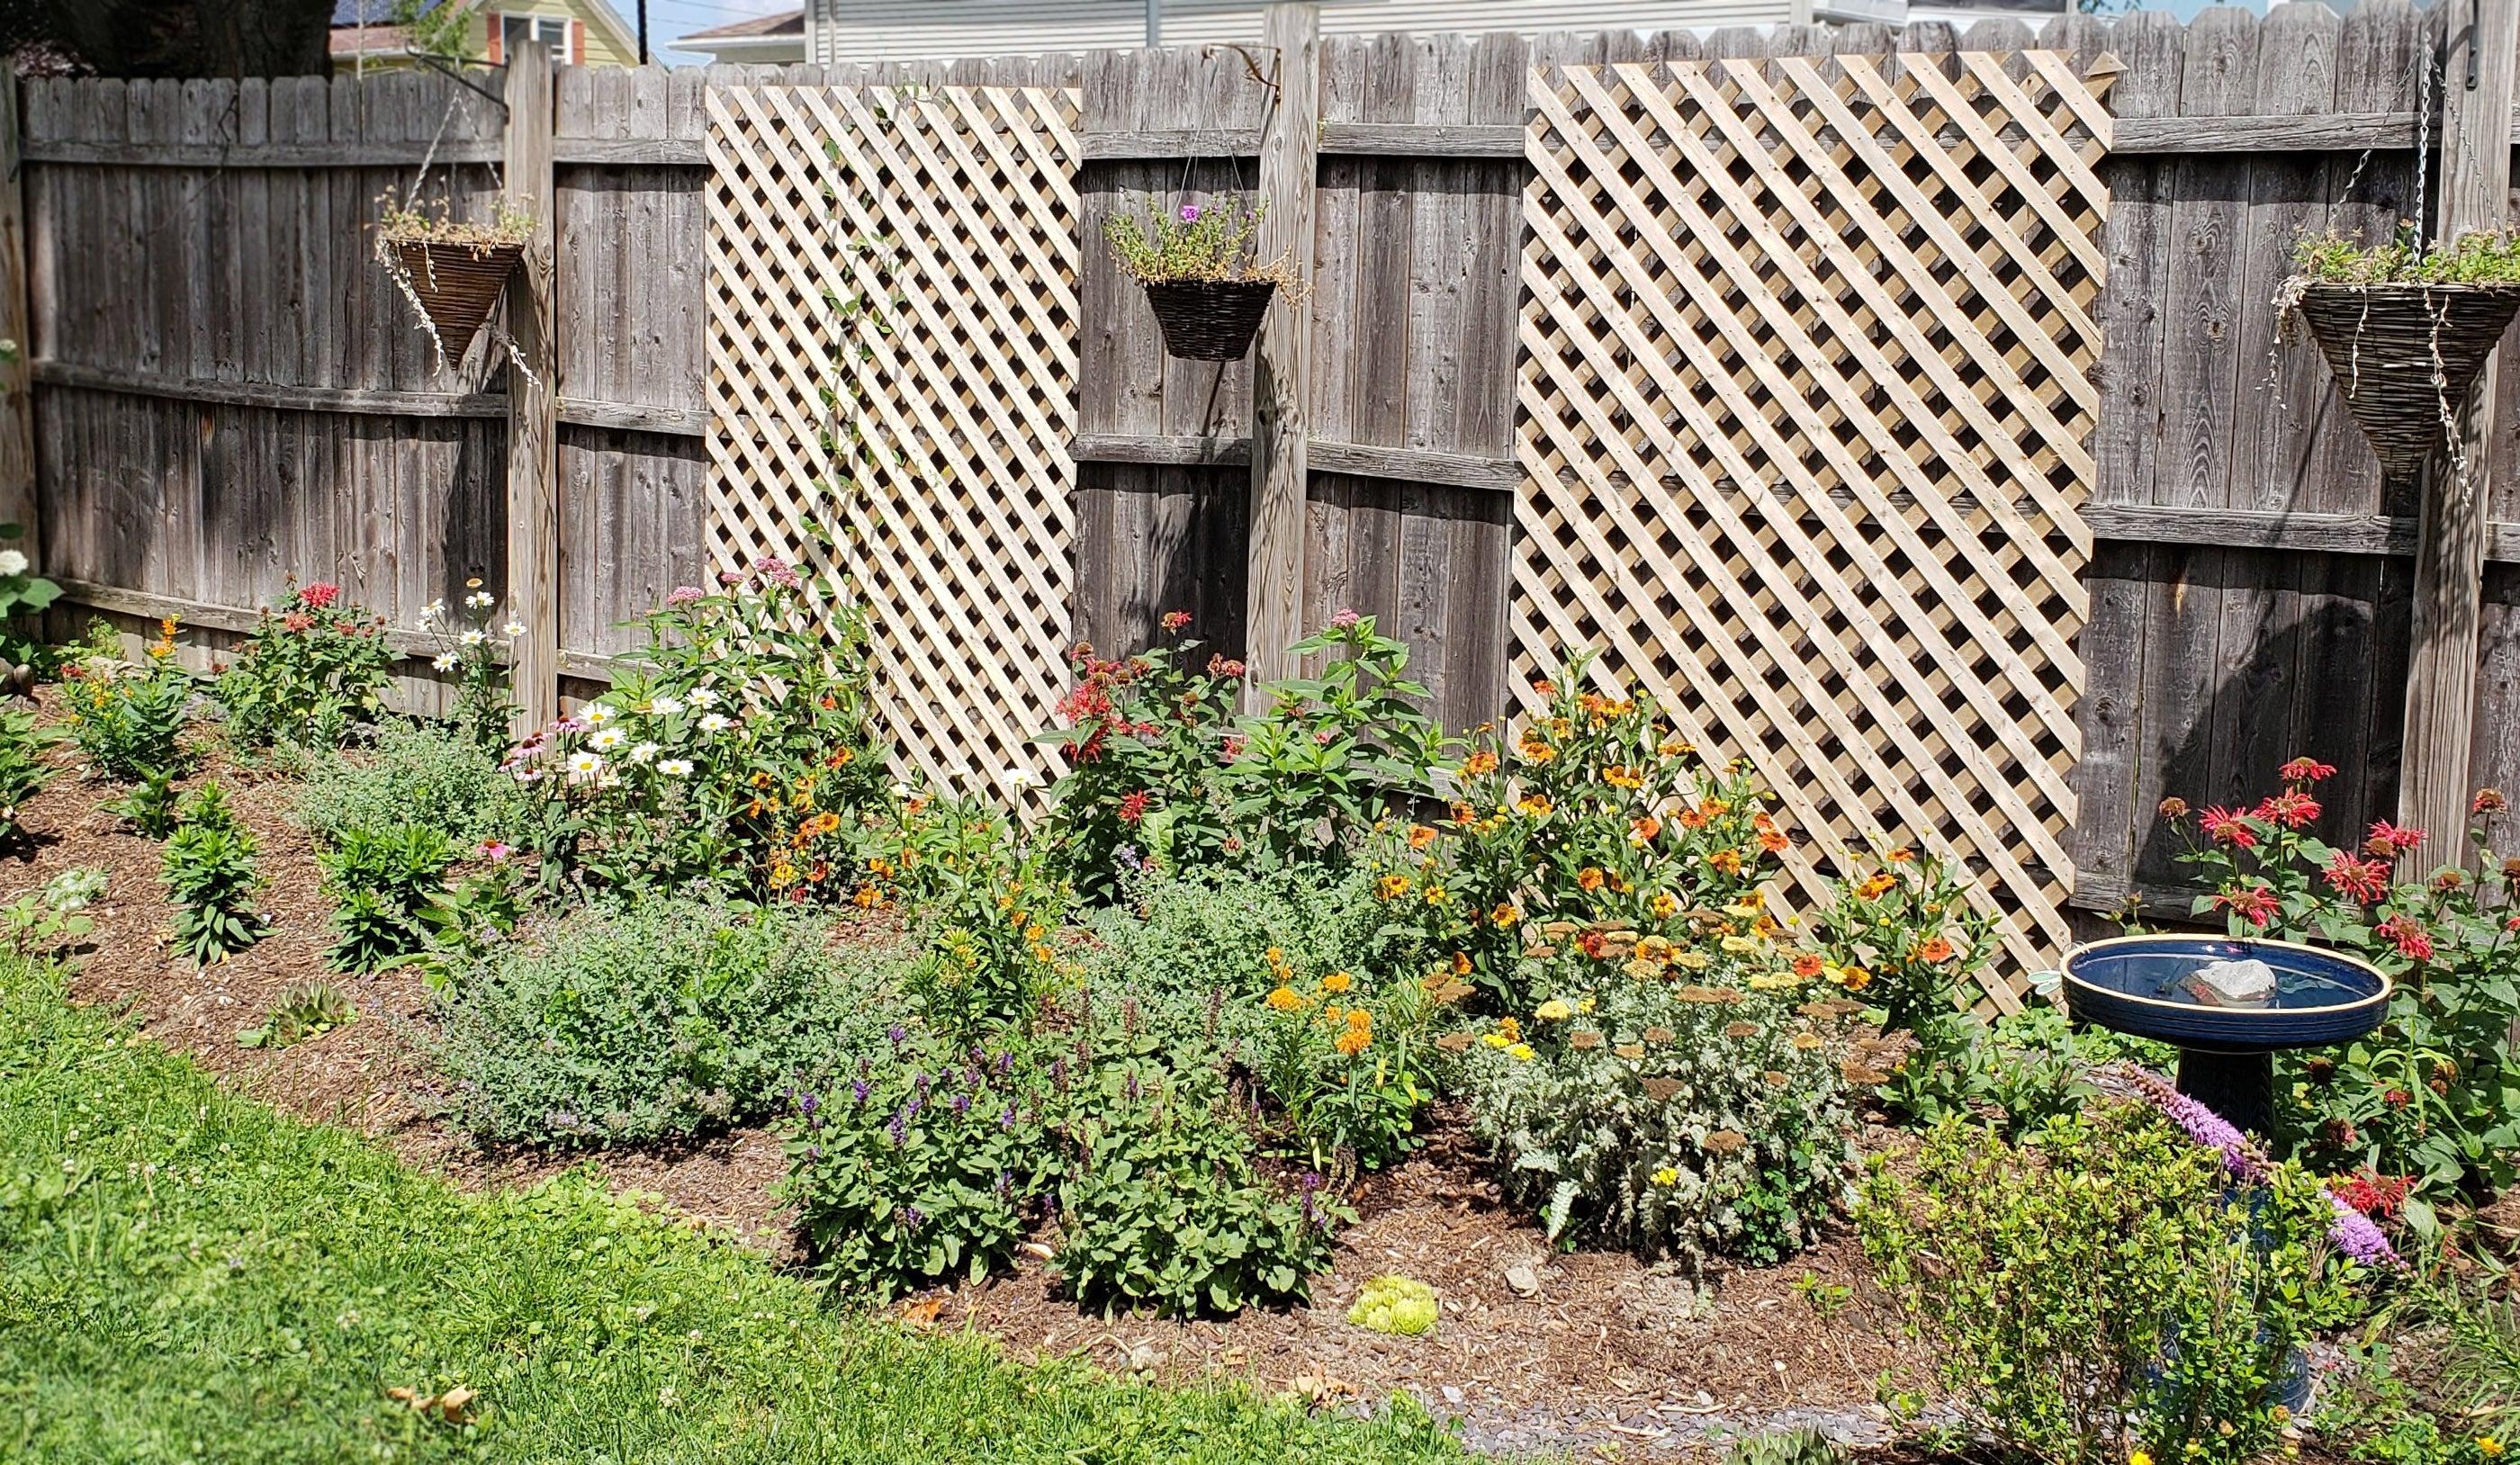 Pre-Planned Garden: Growth in June